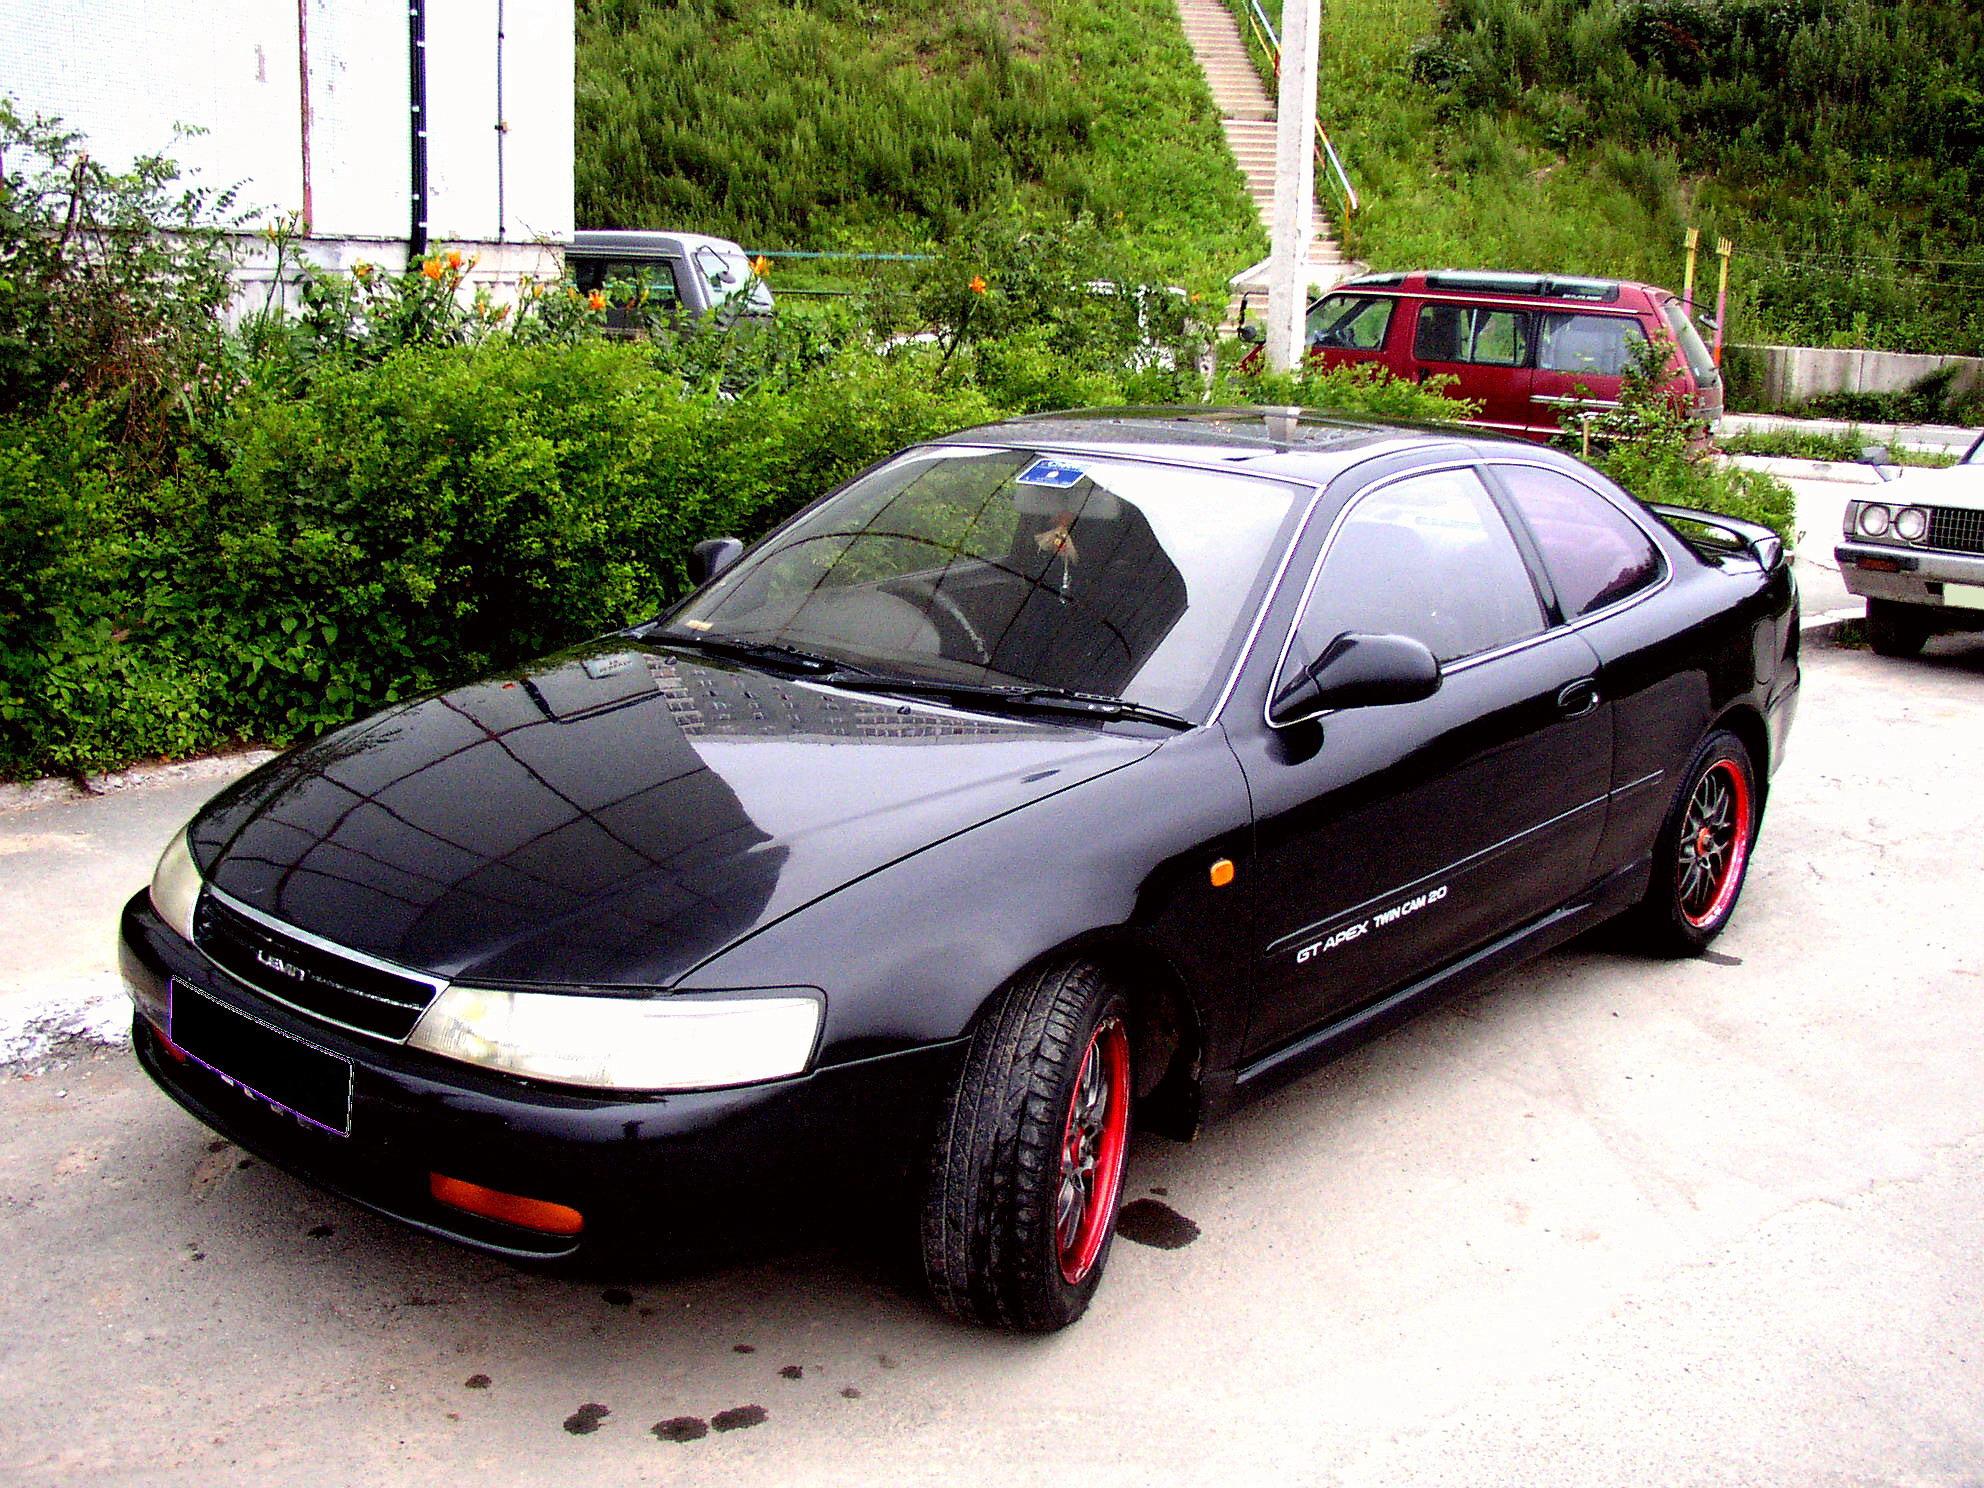 1993 Toyota Corolla Image 5 Wiring Diagram